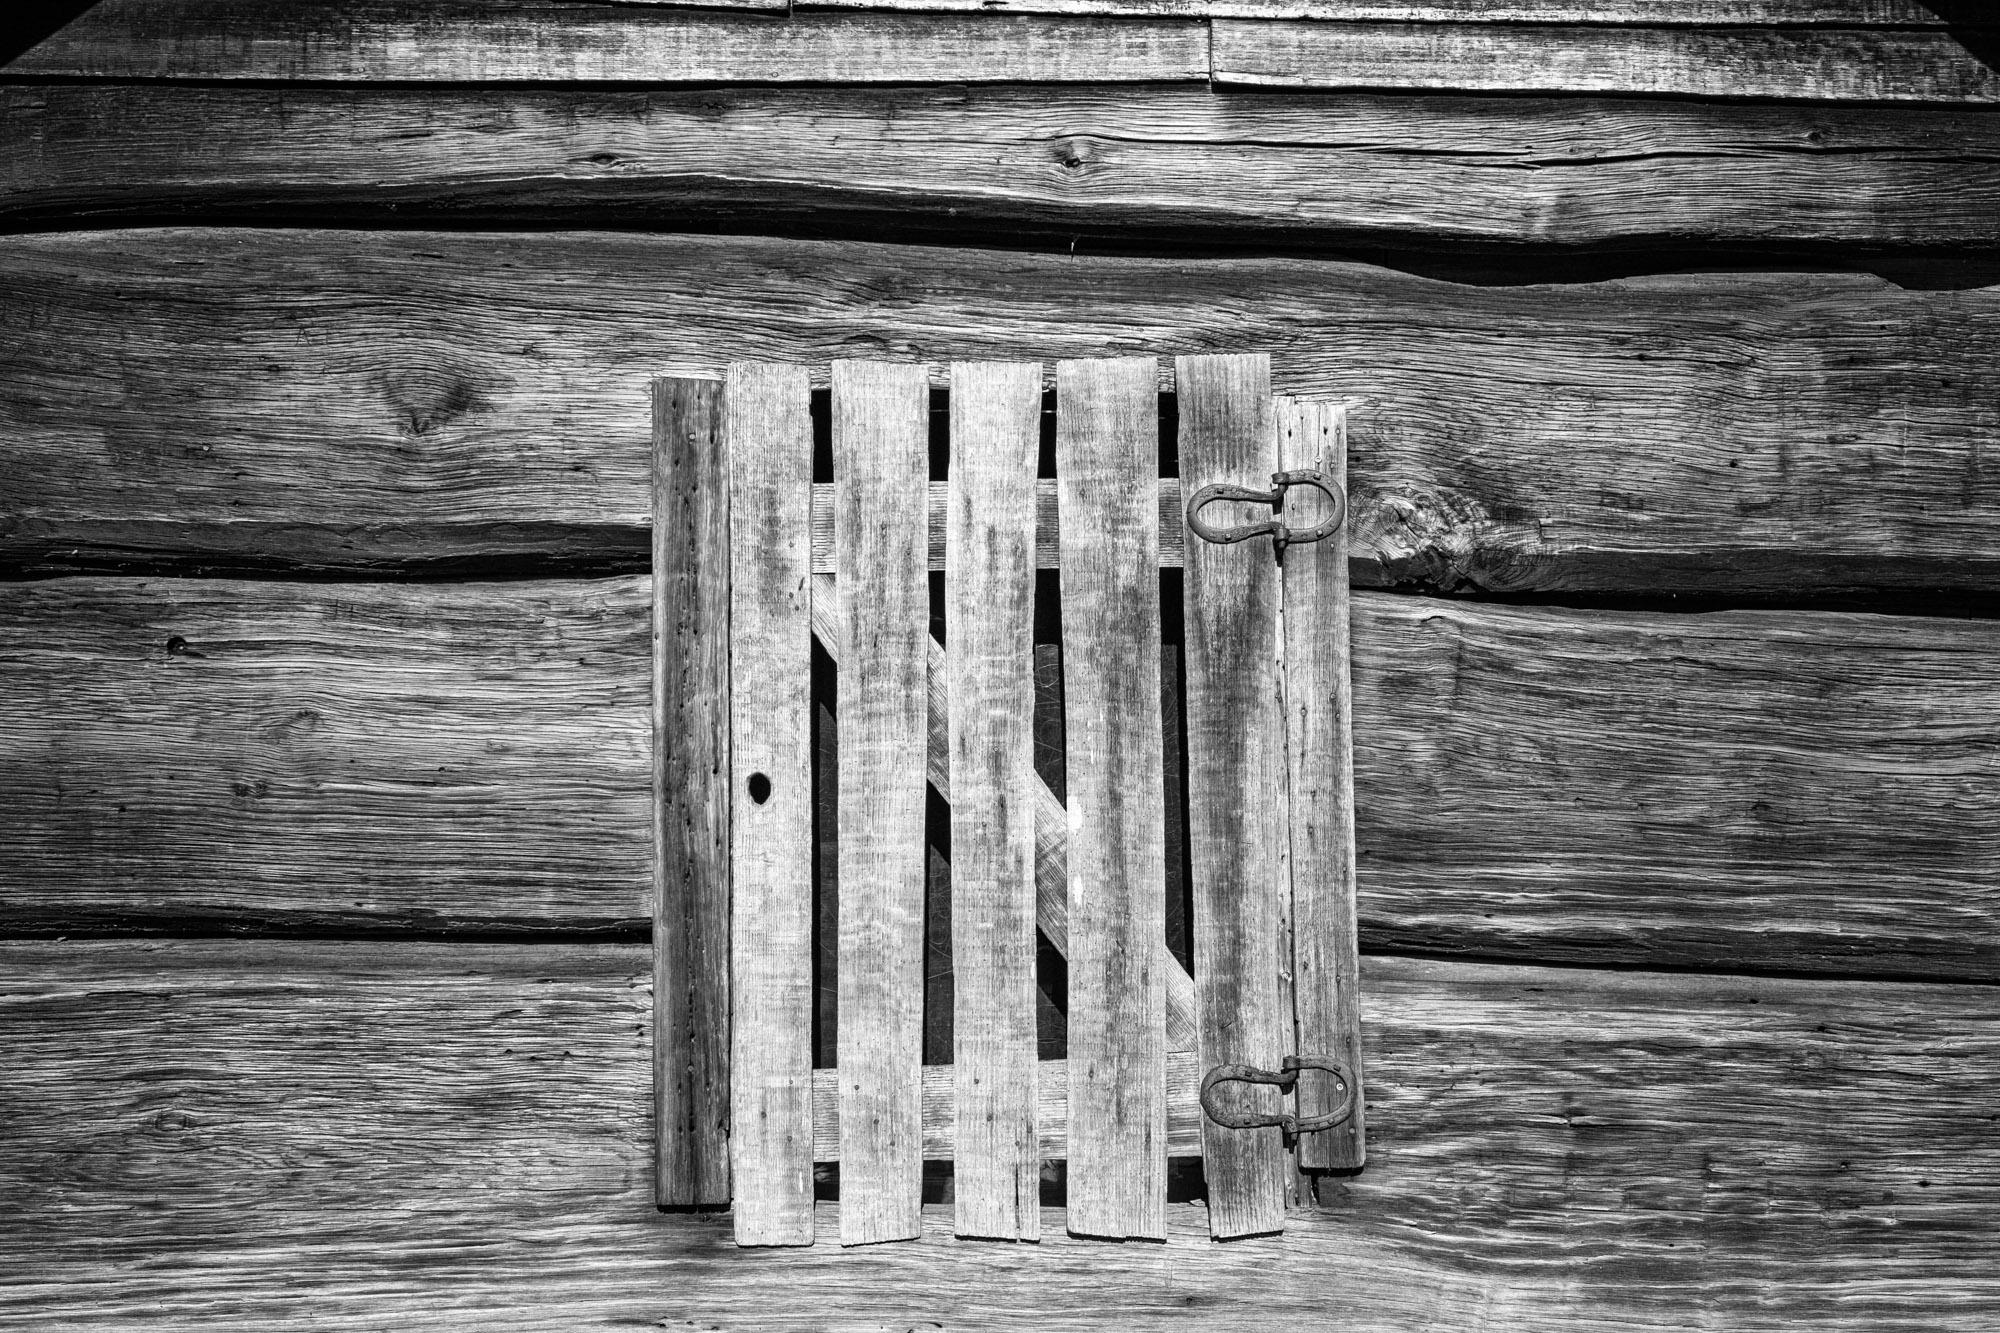 Old barn doors from the settler's days.